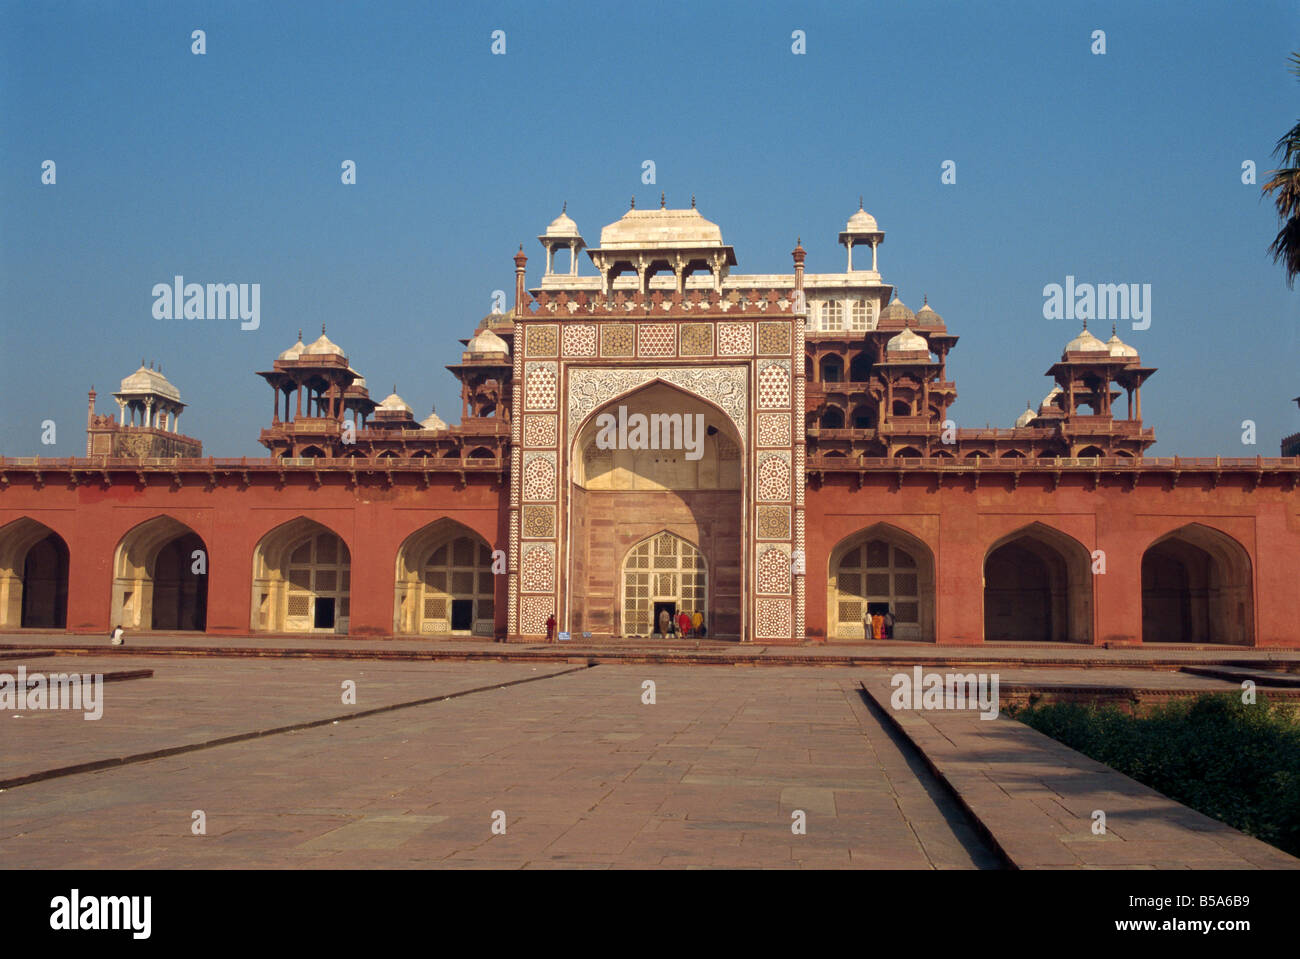 Akbar s Mausoleum built in 1602 by Akbar Sikandra Agra Uttar Pradesh state India Asia - Stock Image